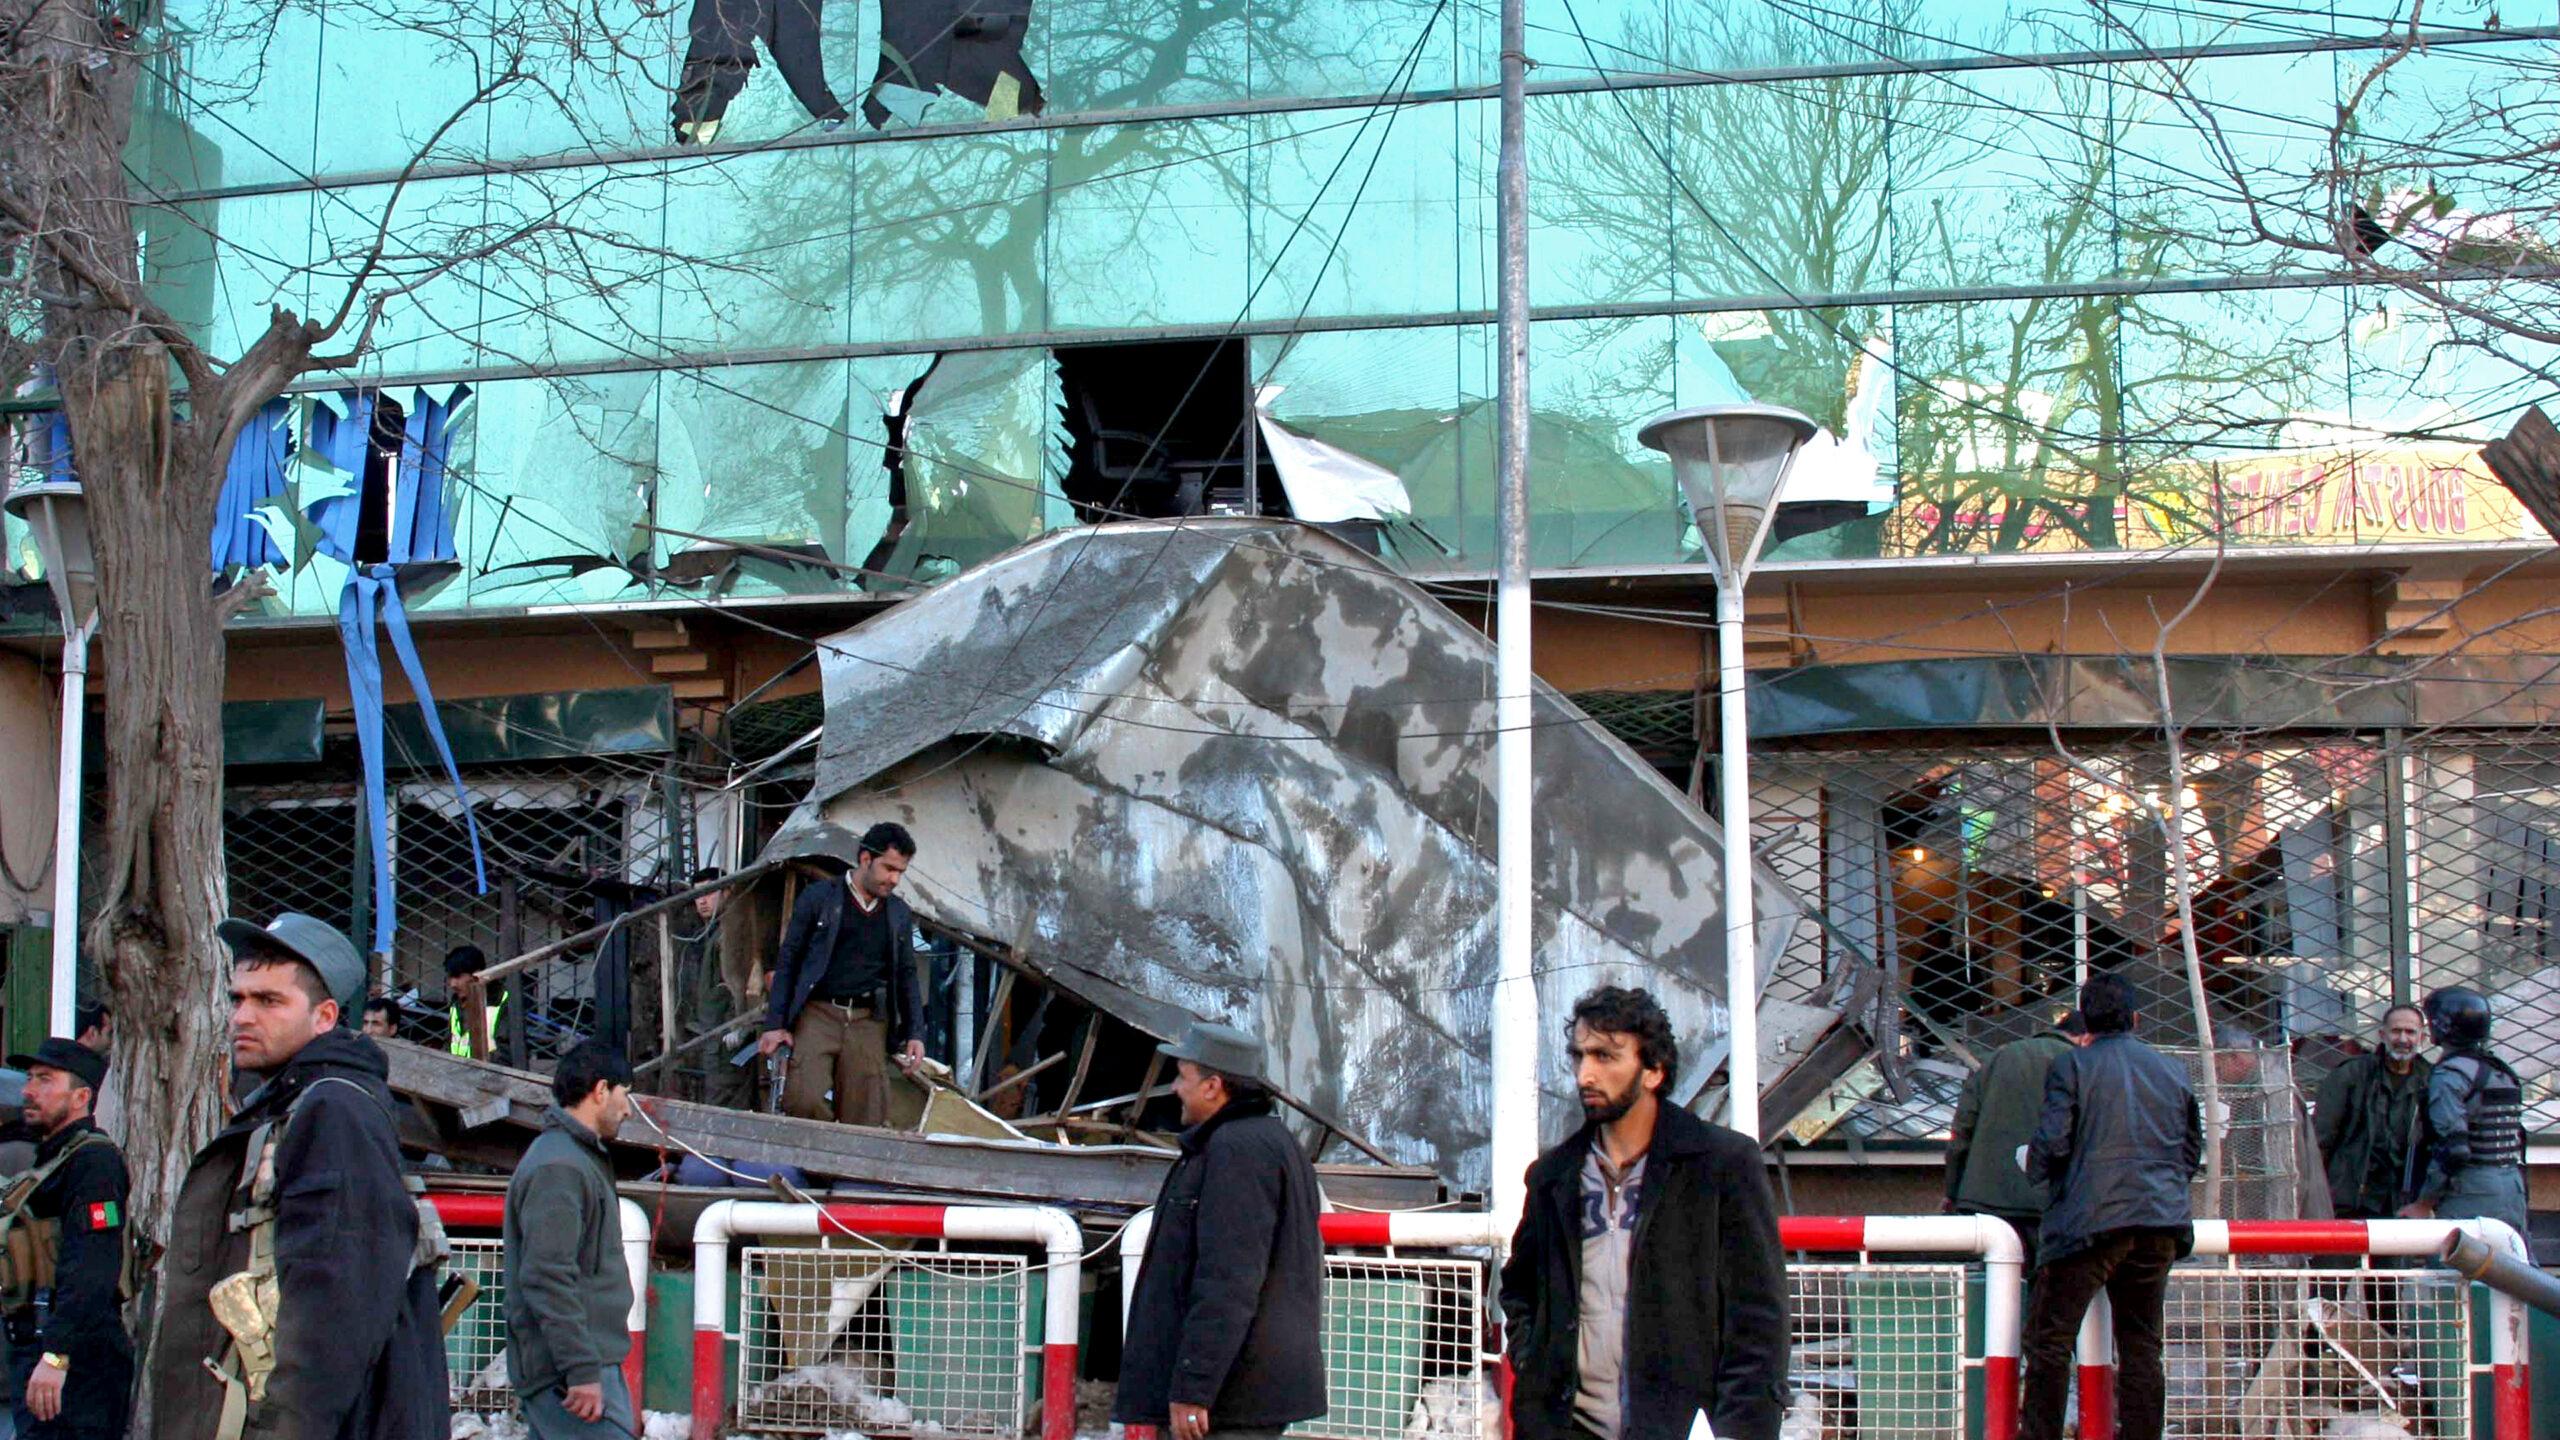 Car Bomb Targeting Lawmaker in Afghanistan Kills at Least 9